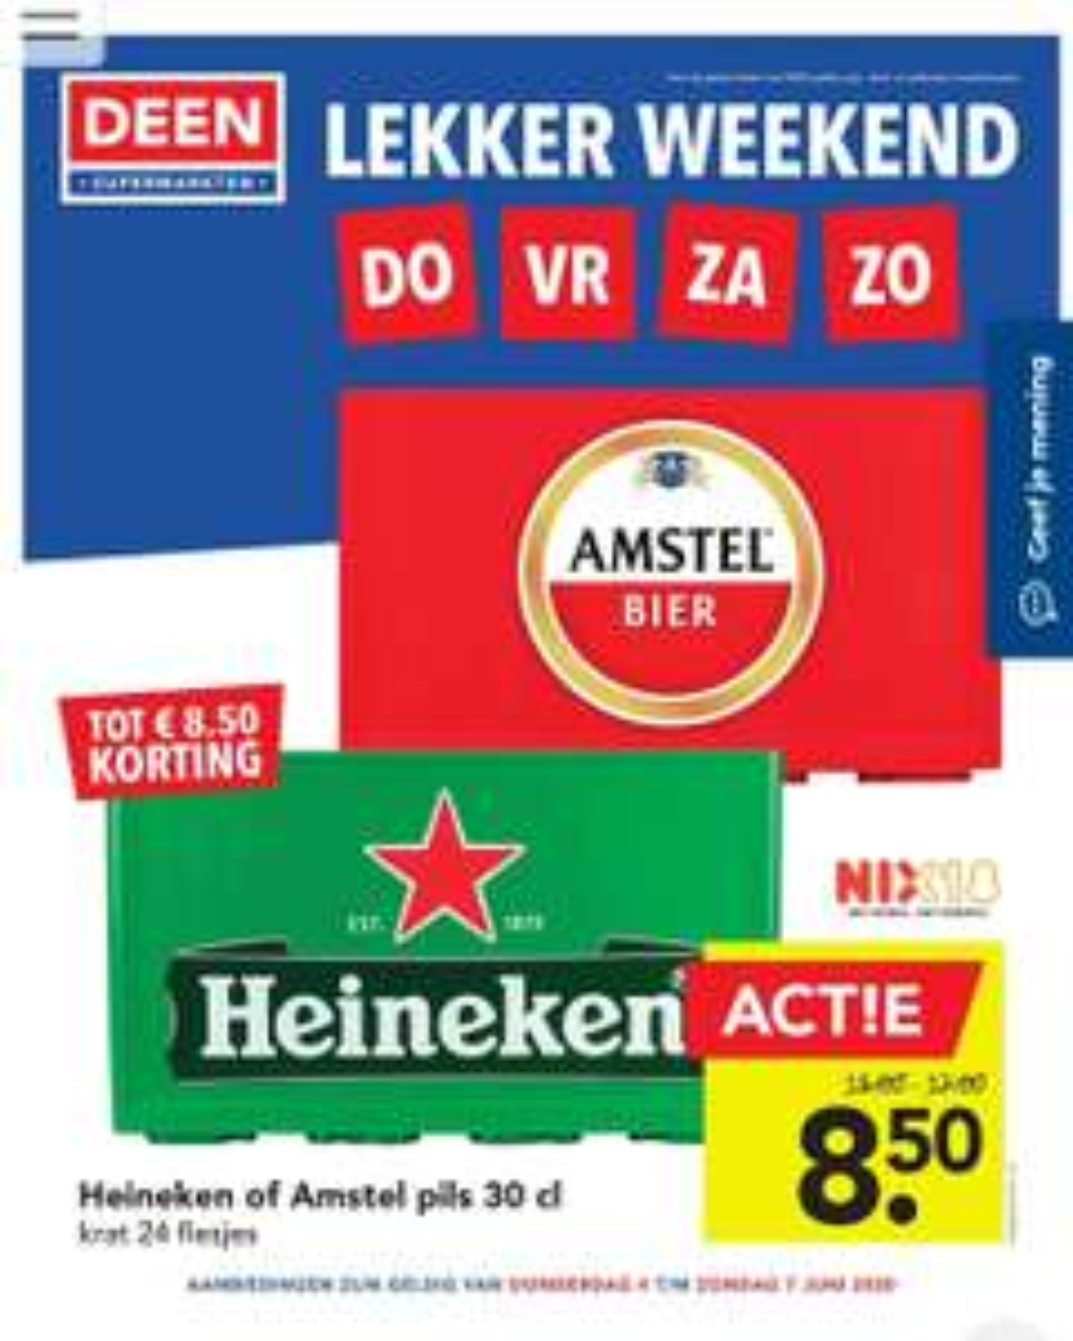 Heineken of Amstel krat 24x30cl €8,50@Deen